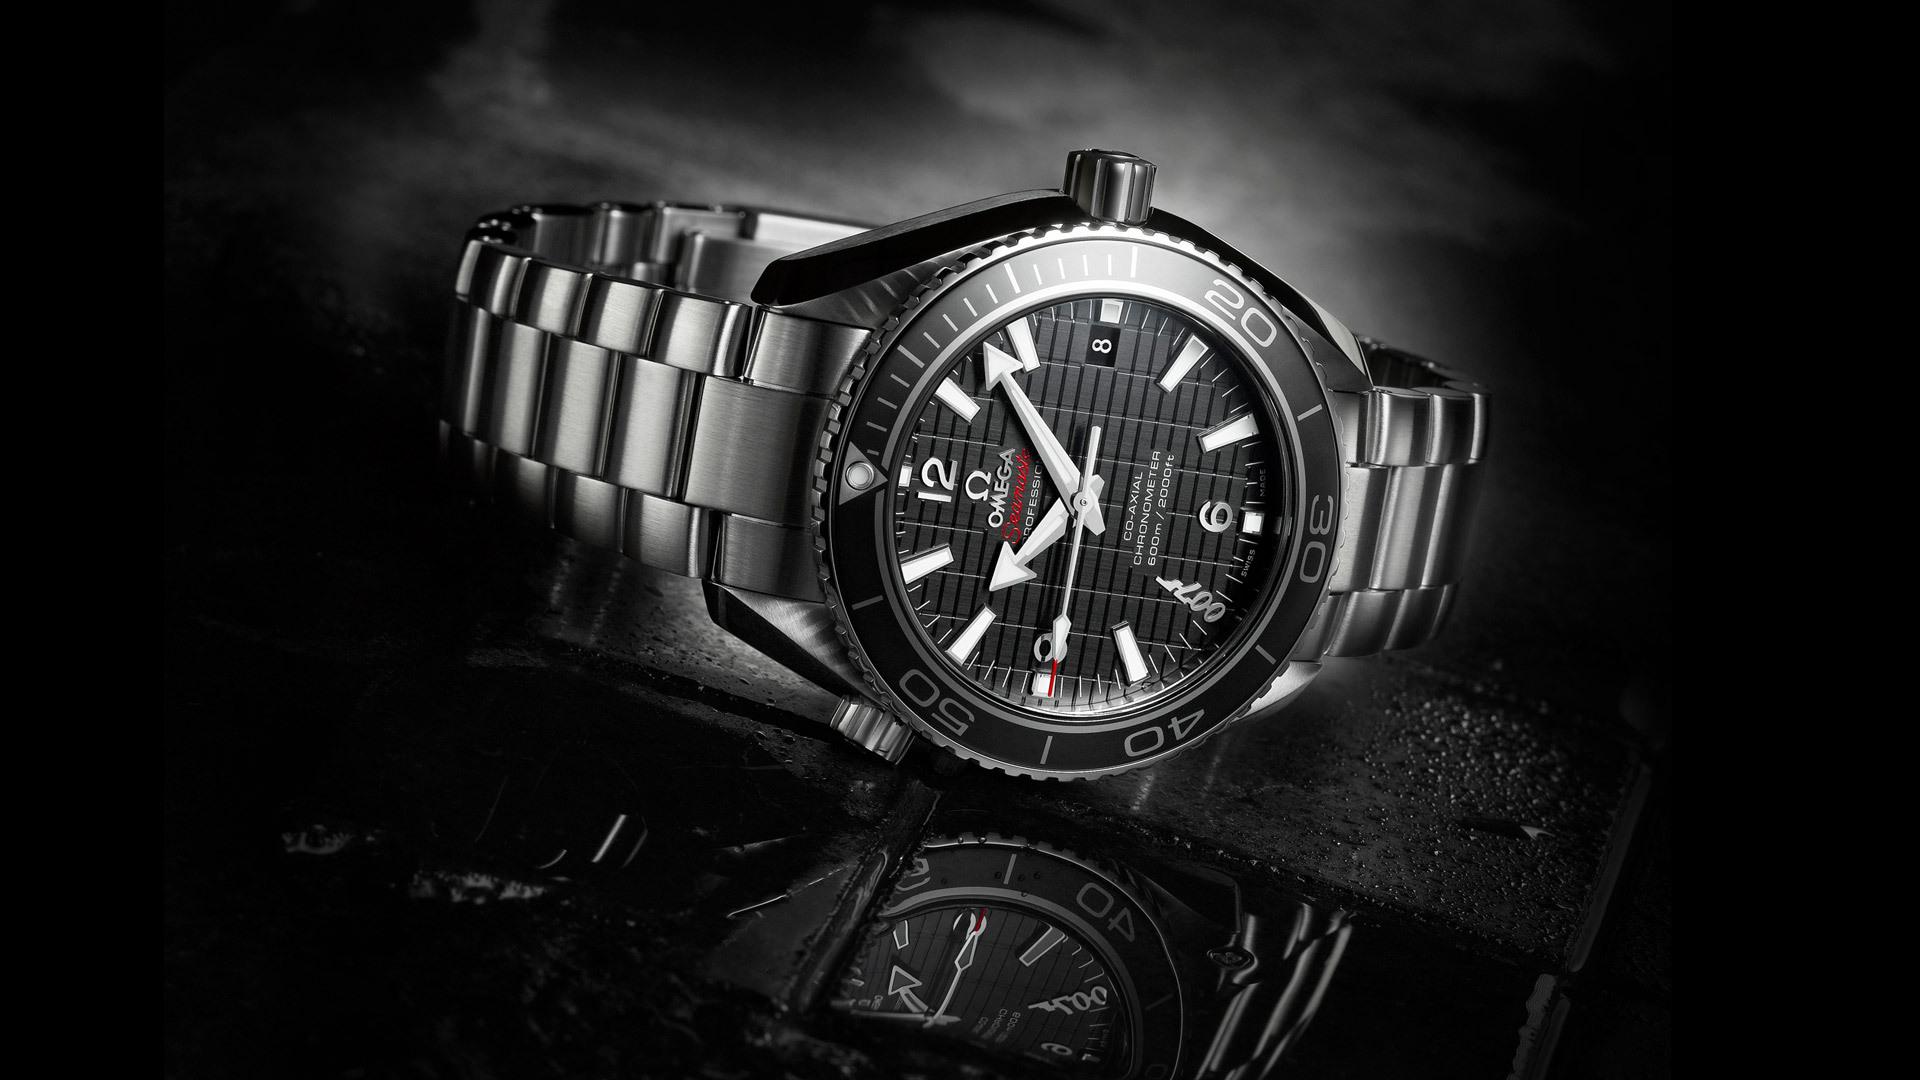 omega omega watch macro 007 Wallpaper 1920x1080